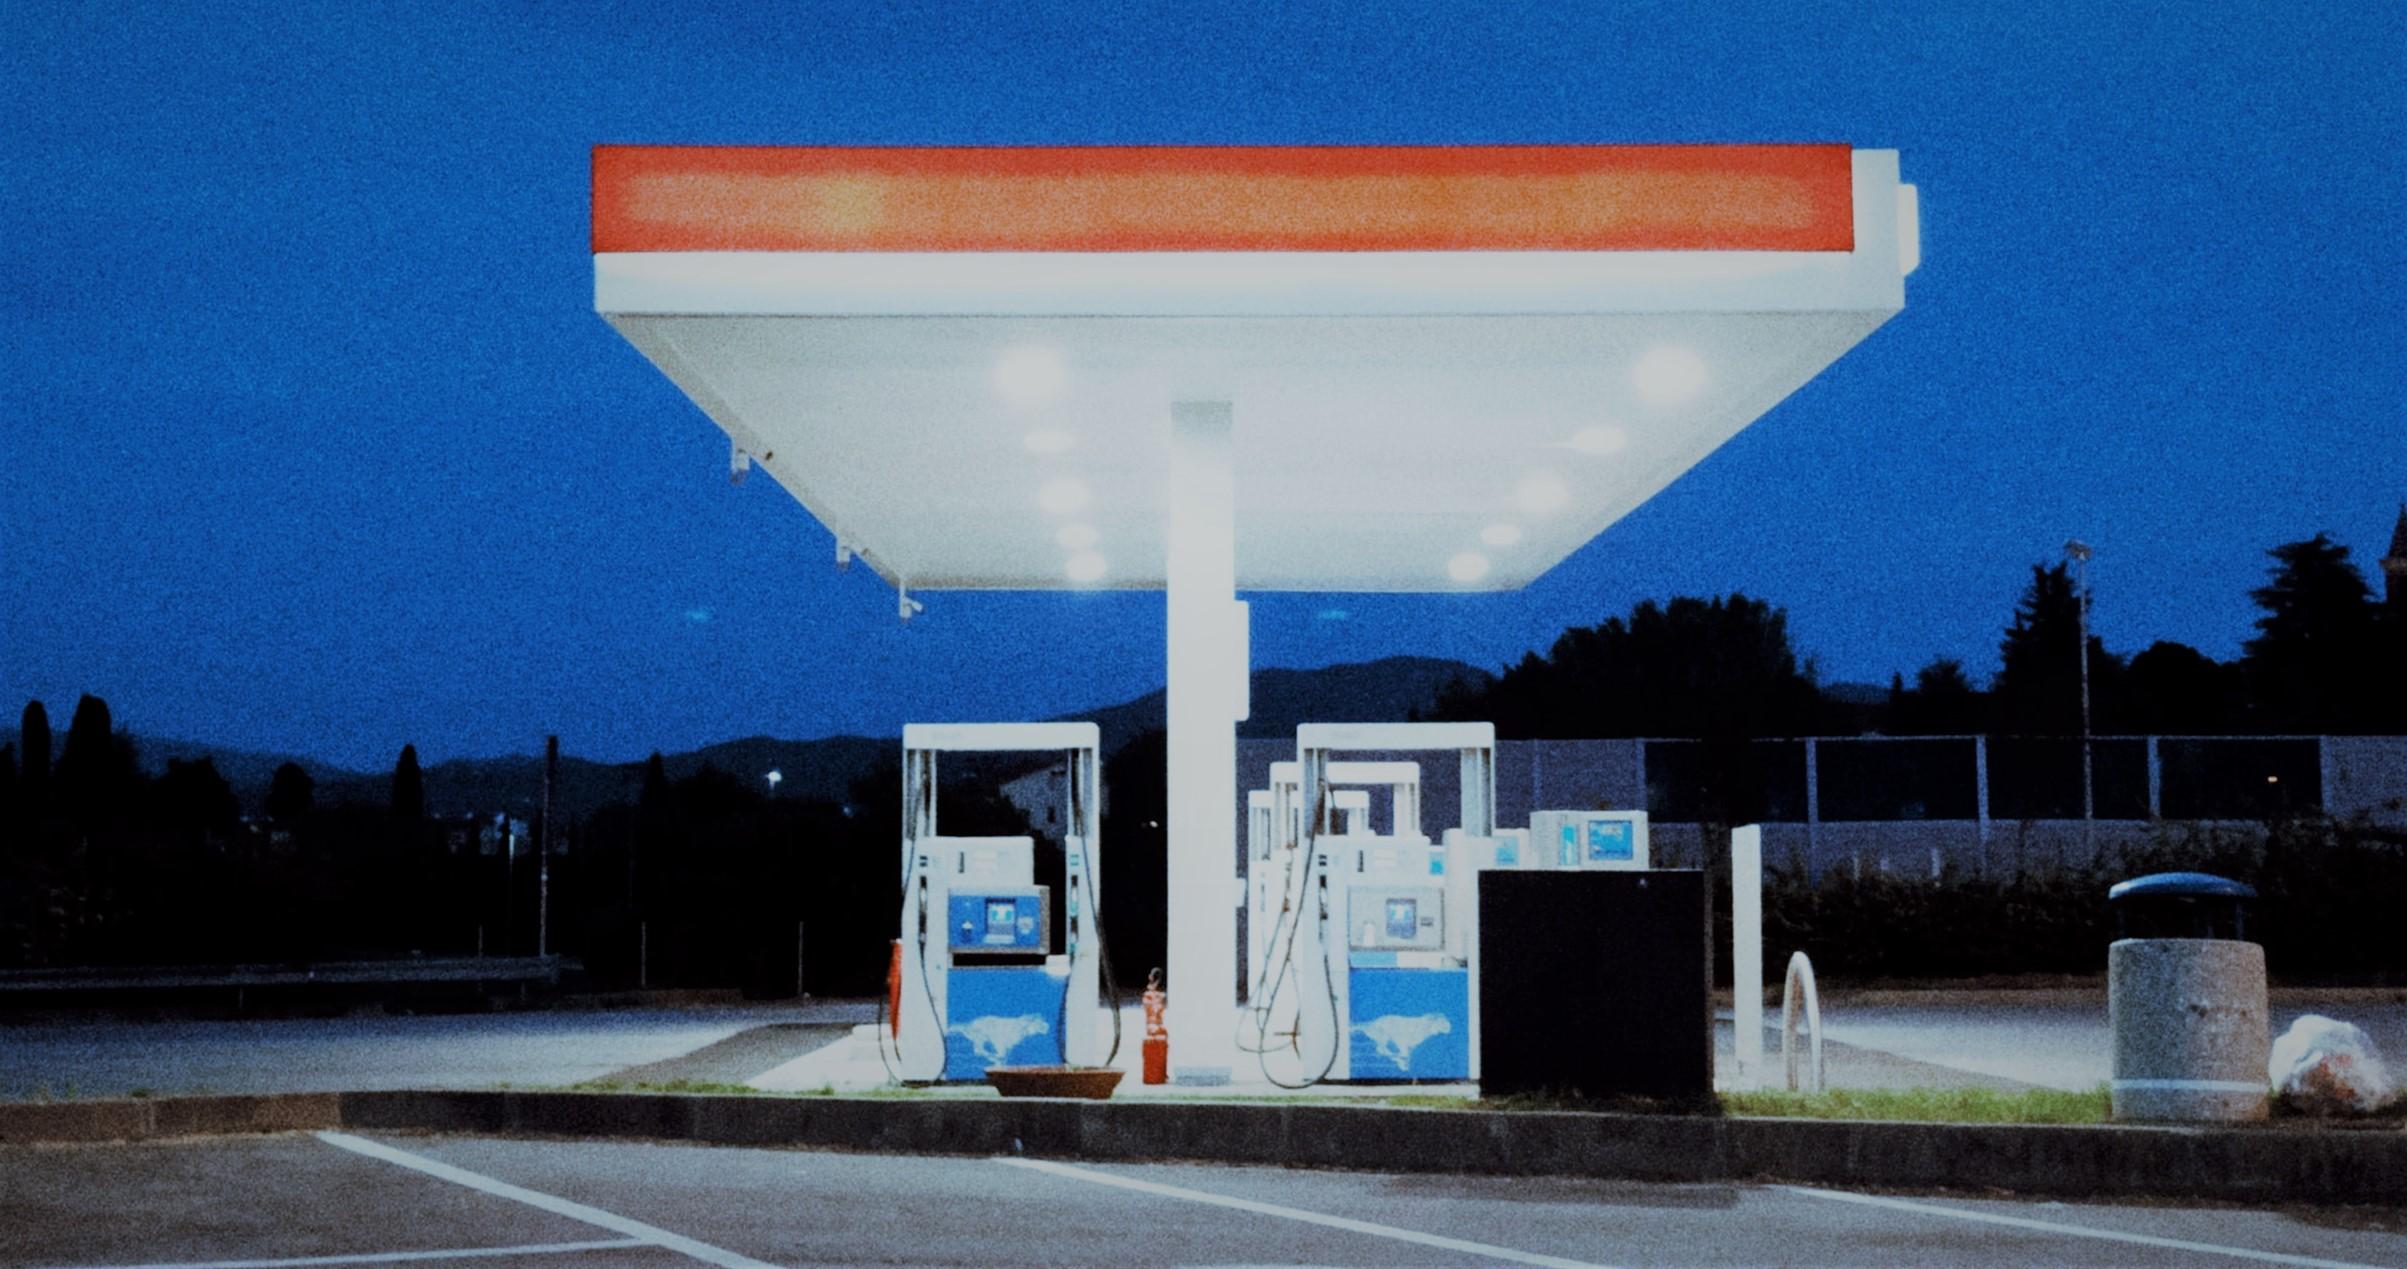 Small Amount of Petrol in Diesel Car